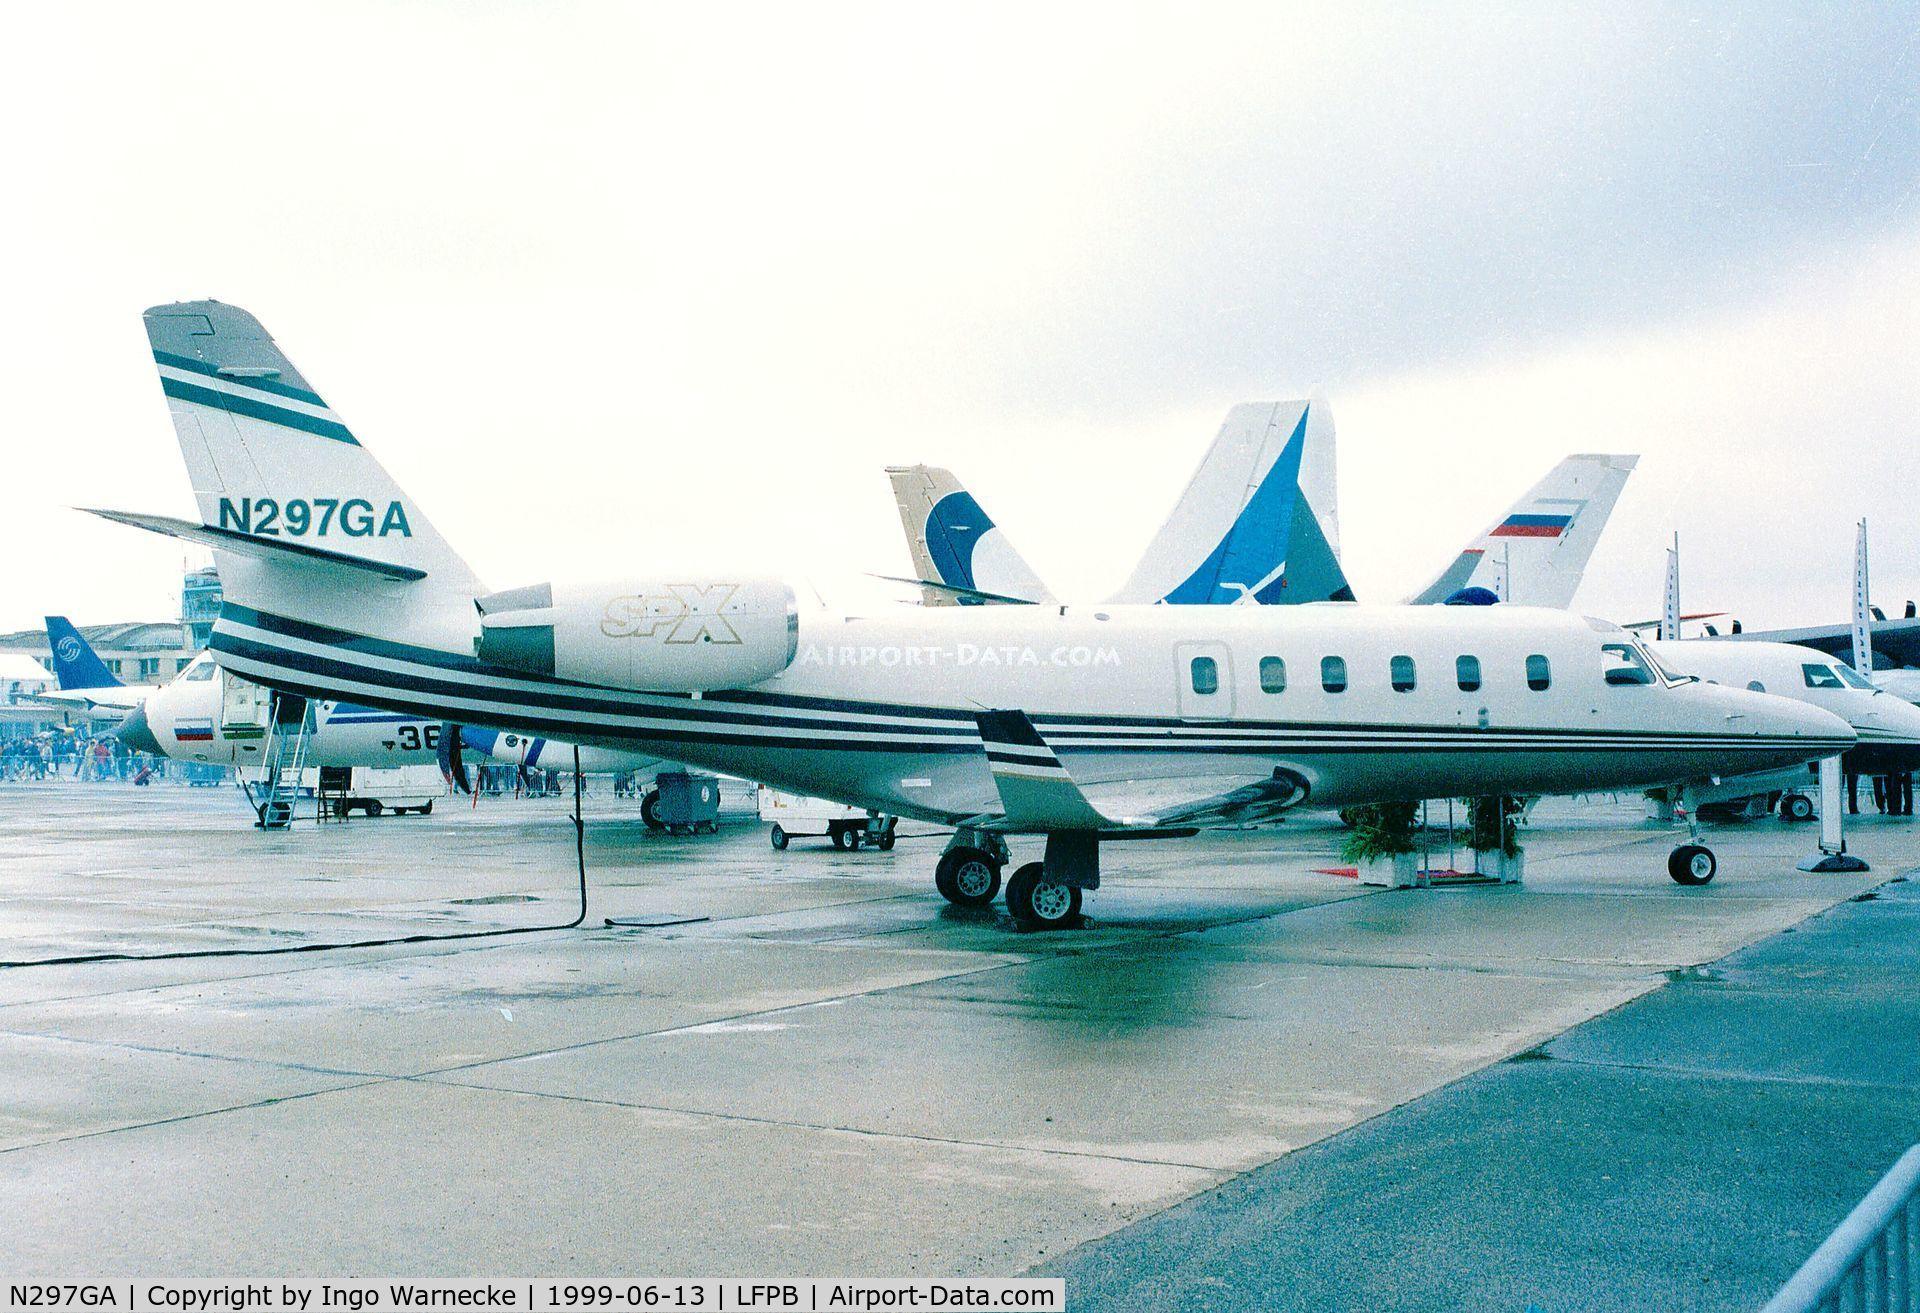 N297GA, 1999 Israel IAI-1125A Astra SPX C/N 111, IAI Astra SPX at the Aerosalon 1999, Paris